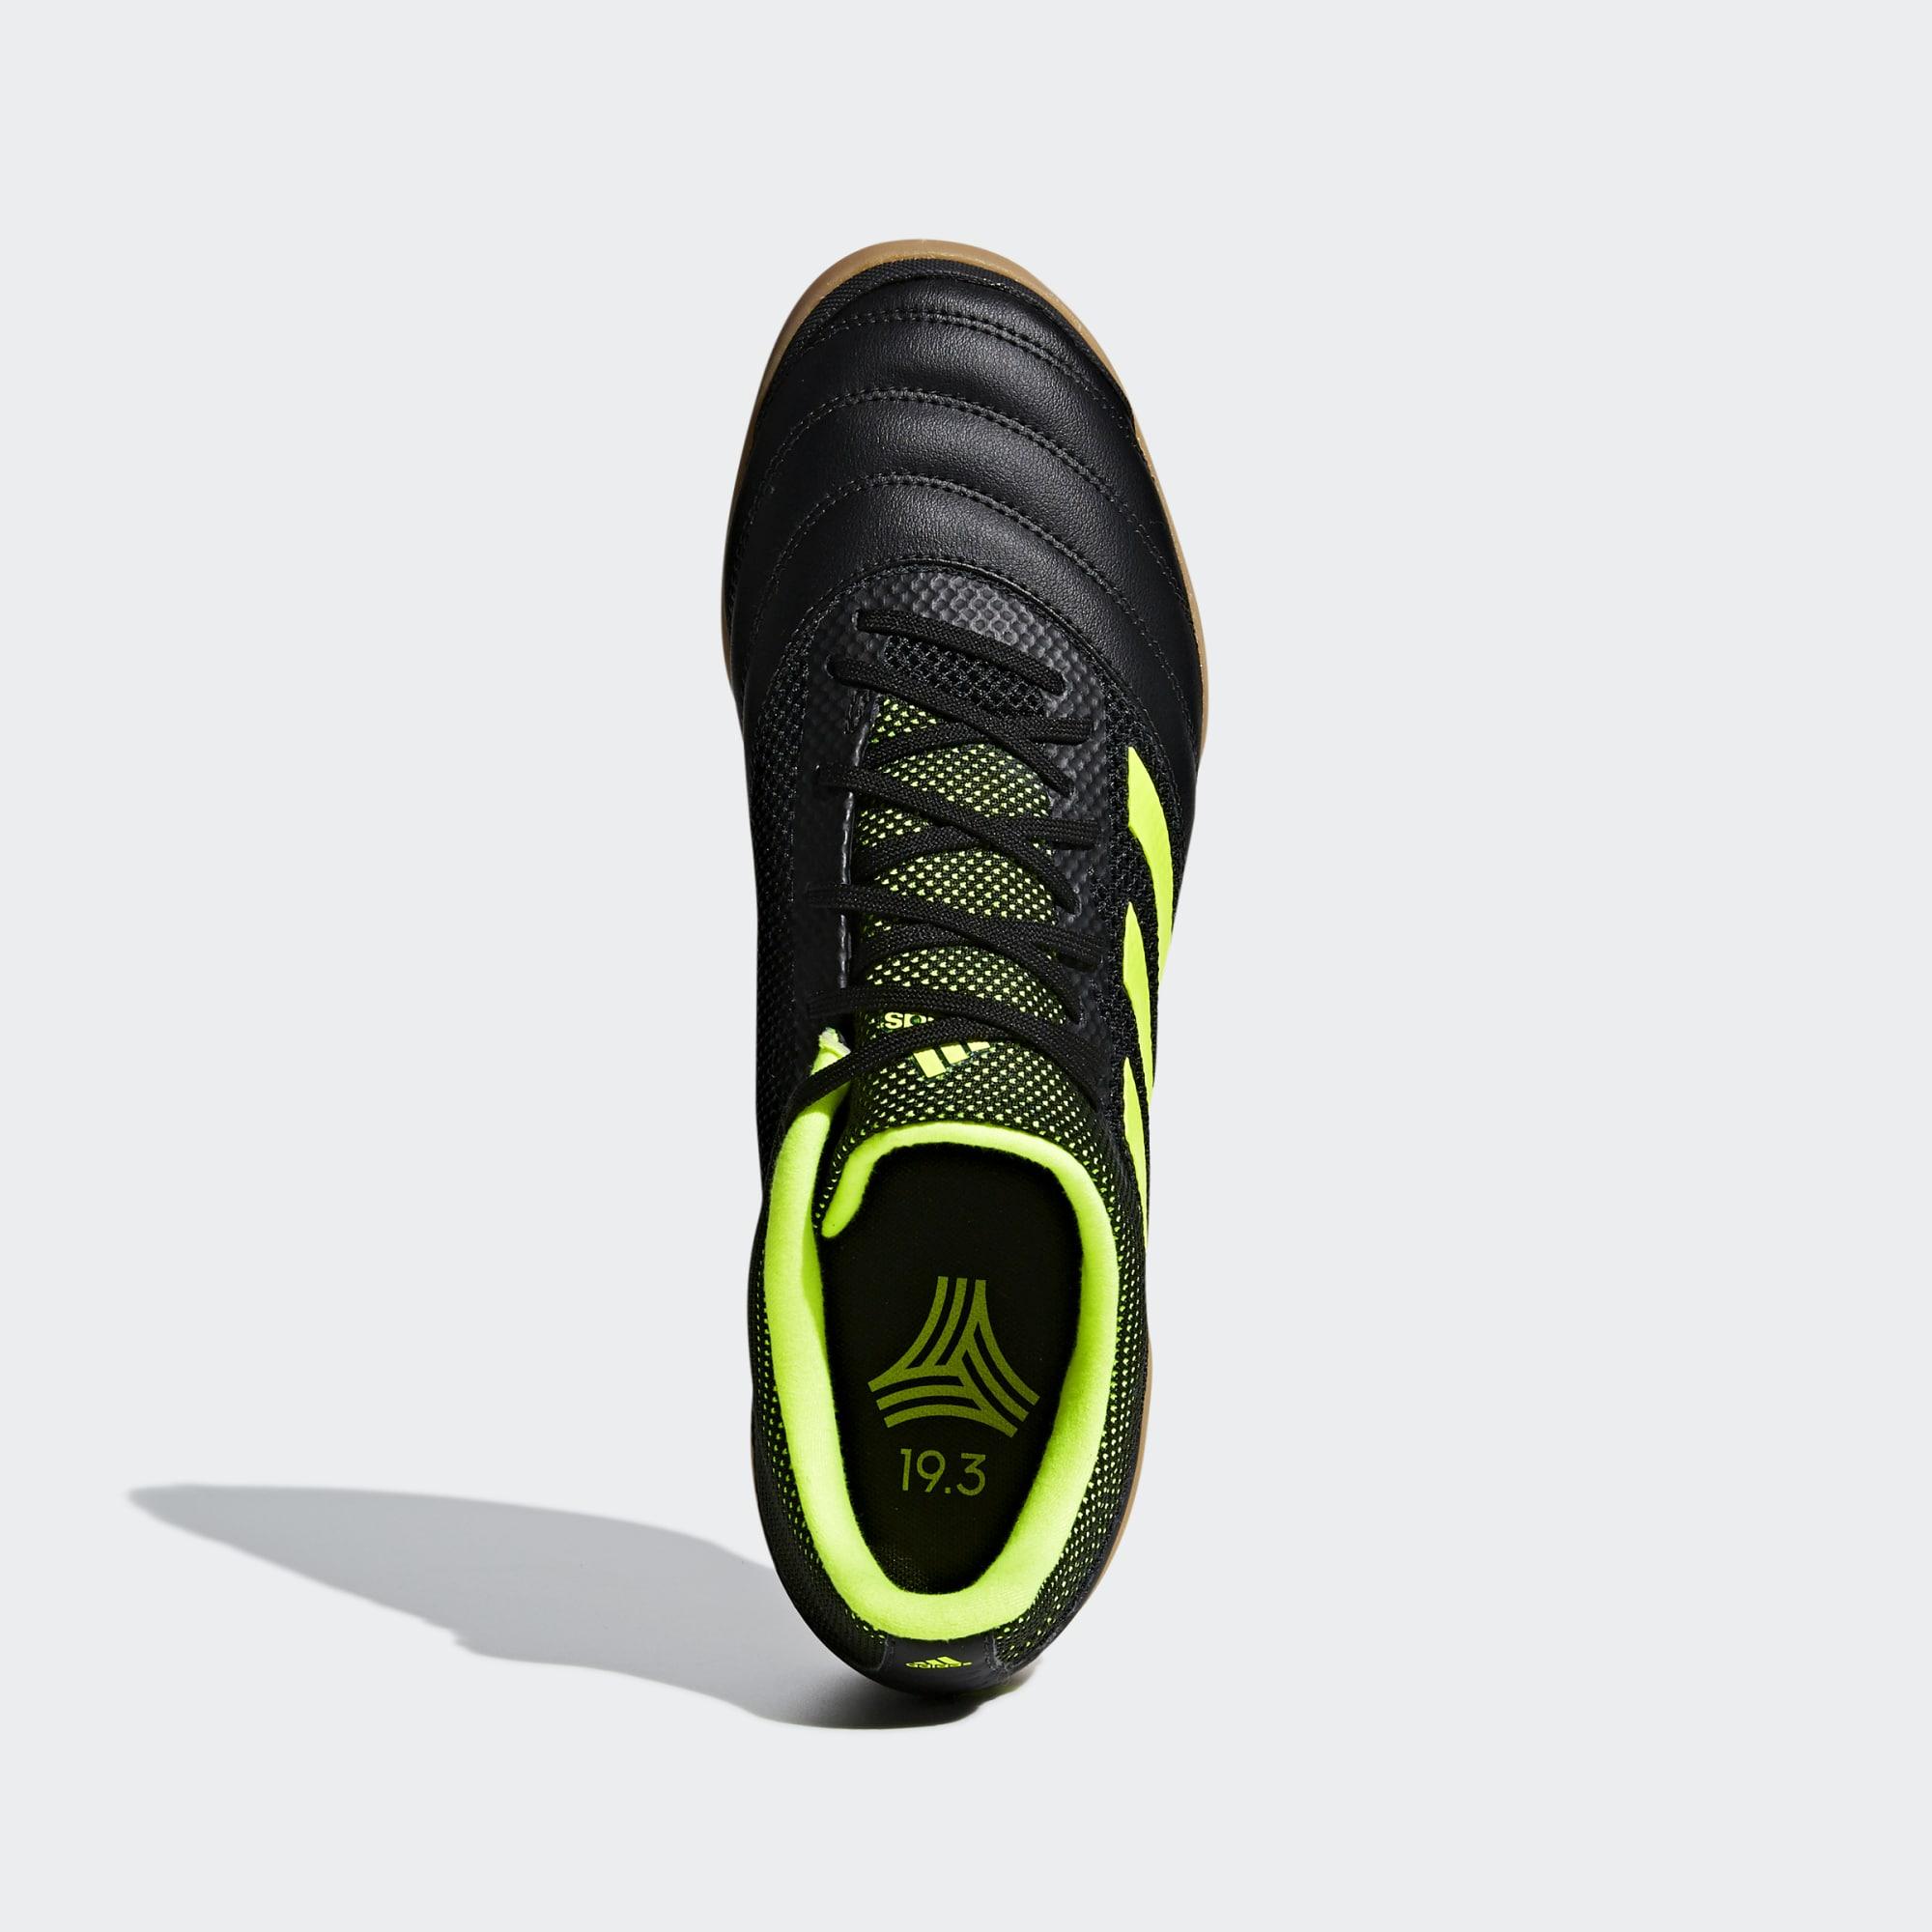 9e7bfaead35 Adidas Copa 19.3 IN Sala Exhibit Shoes - Core Black   Solar Yellow   Gum M1